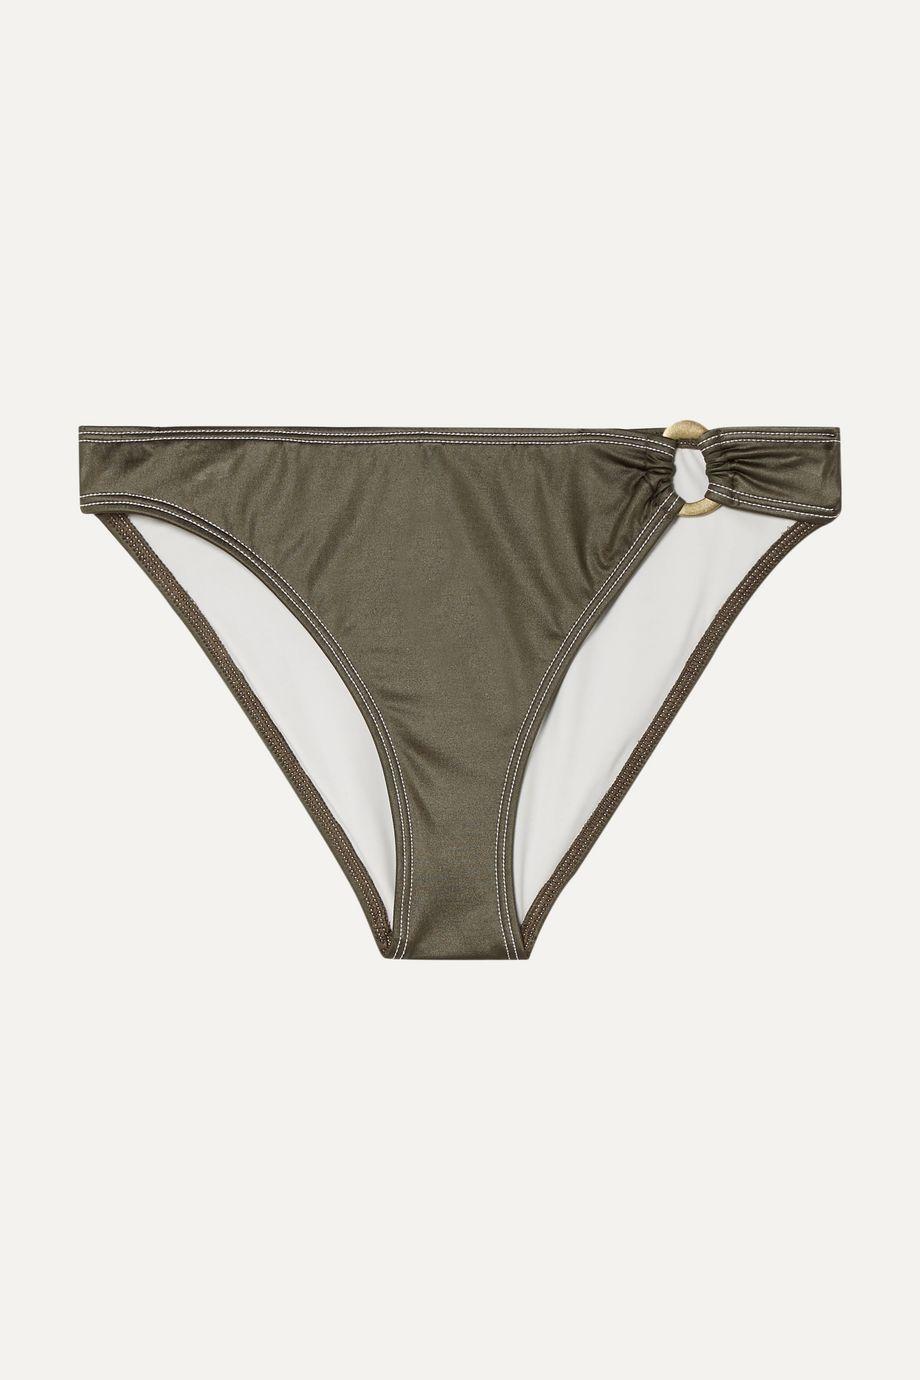 Solid & Striped The Mimi coated stretch bikini briefs